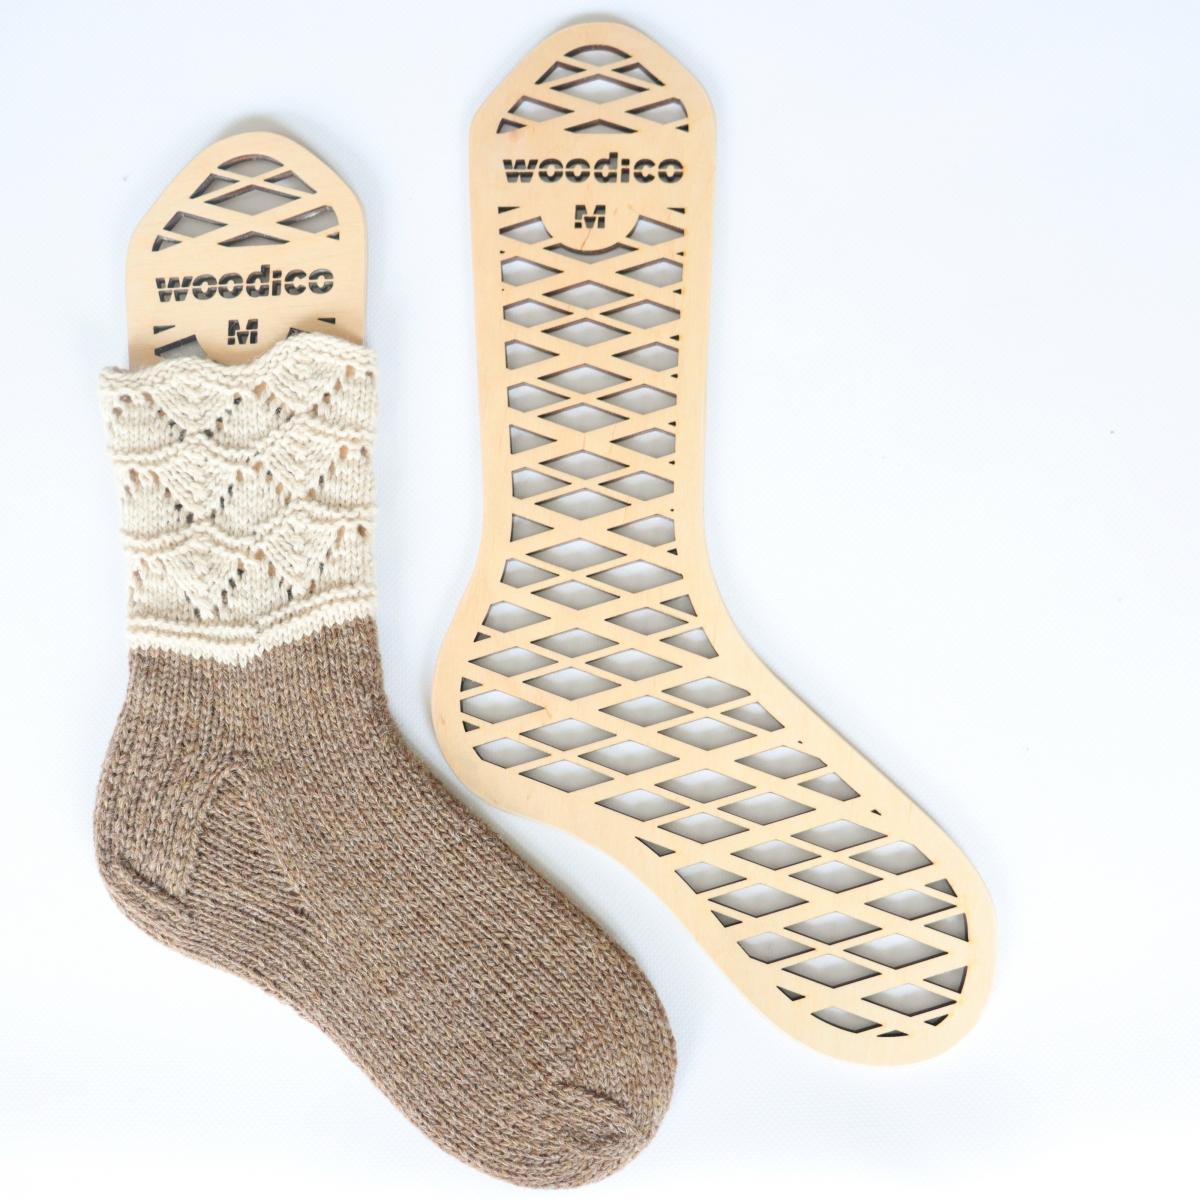 woodico.pro wooden sock blockers sennit 5 1200x1200 - Wooden sock blockers / Sennit